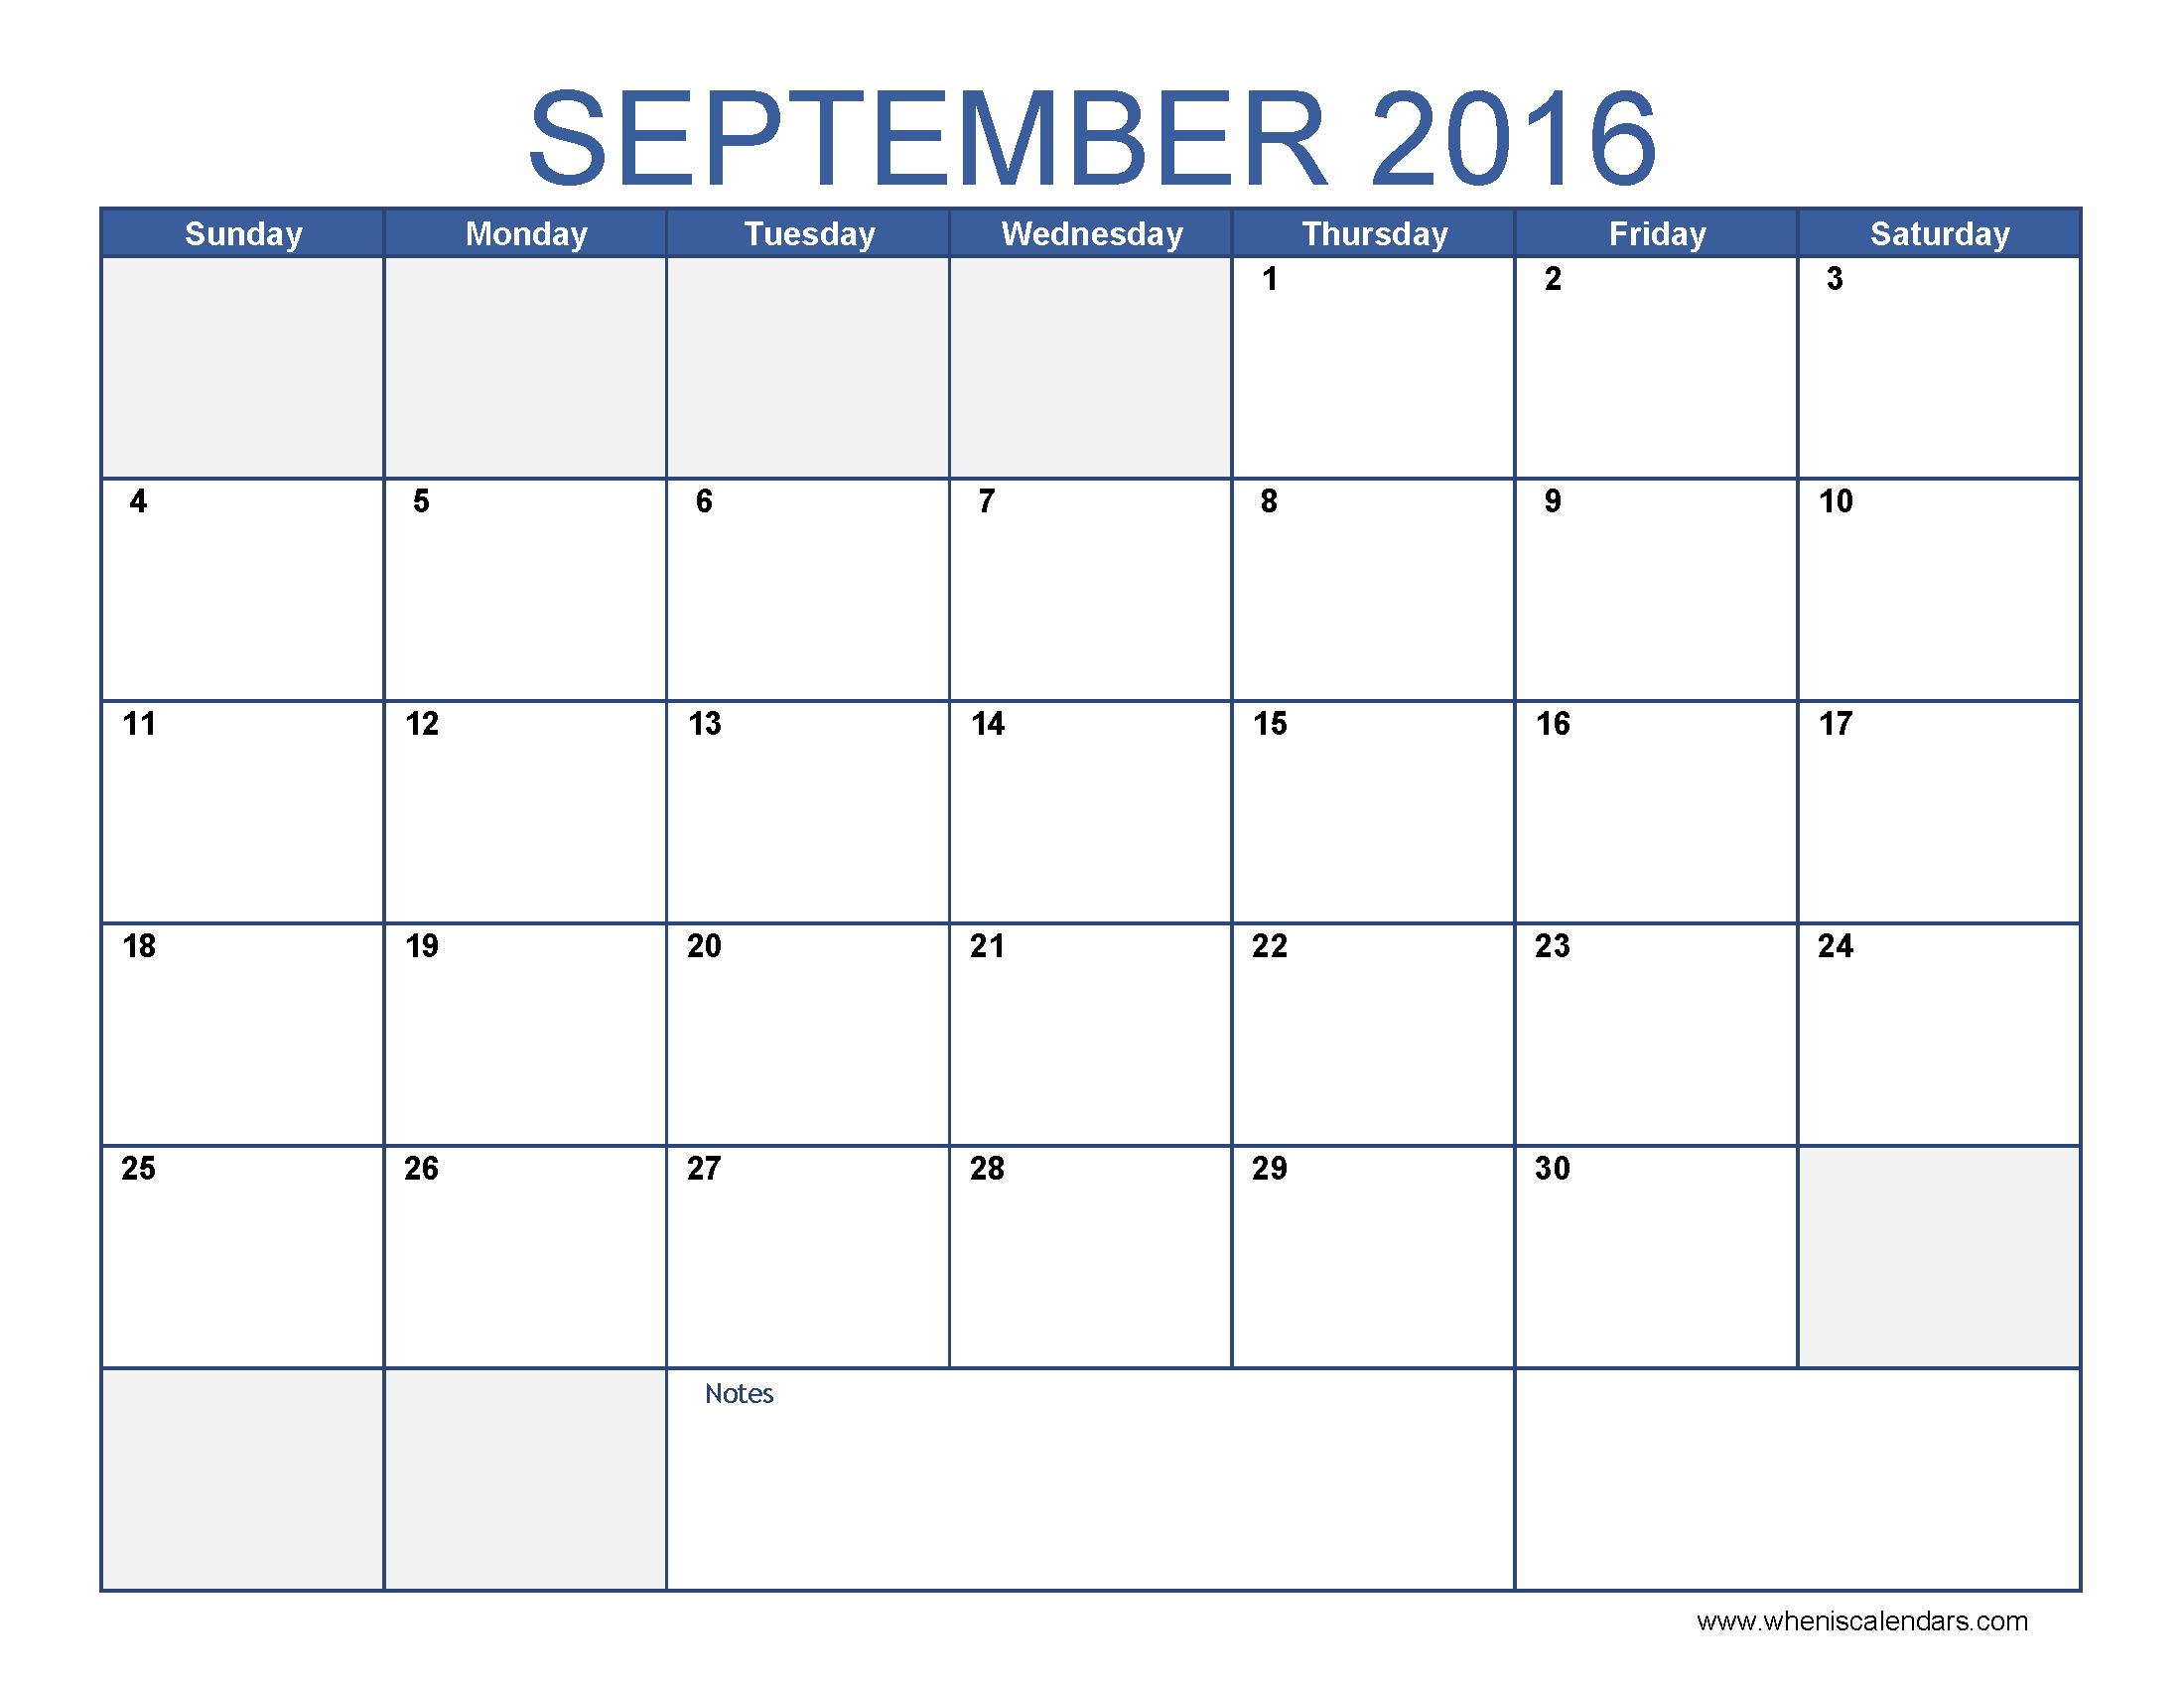 Calendar Labor Day : September labor day calendar clipart clipground